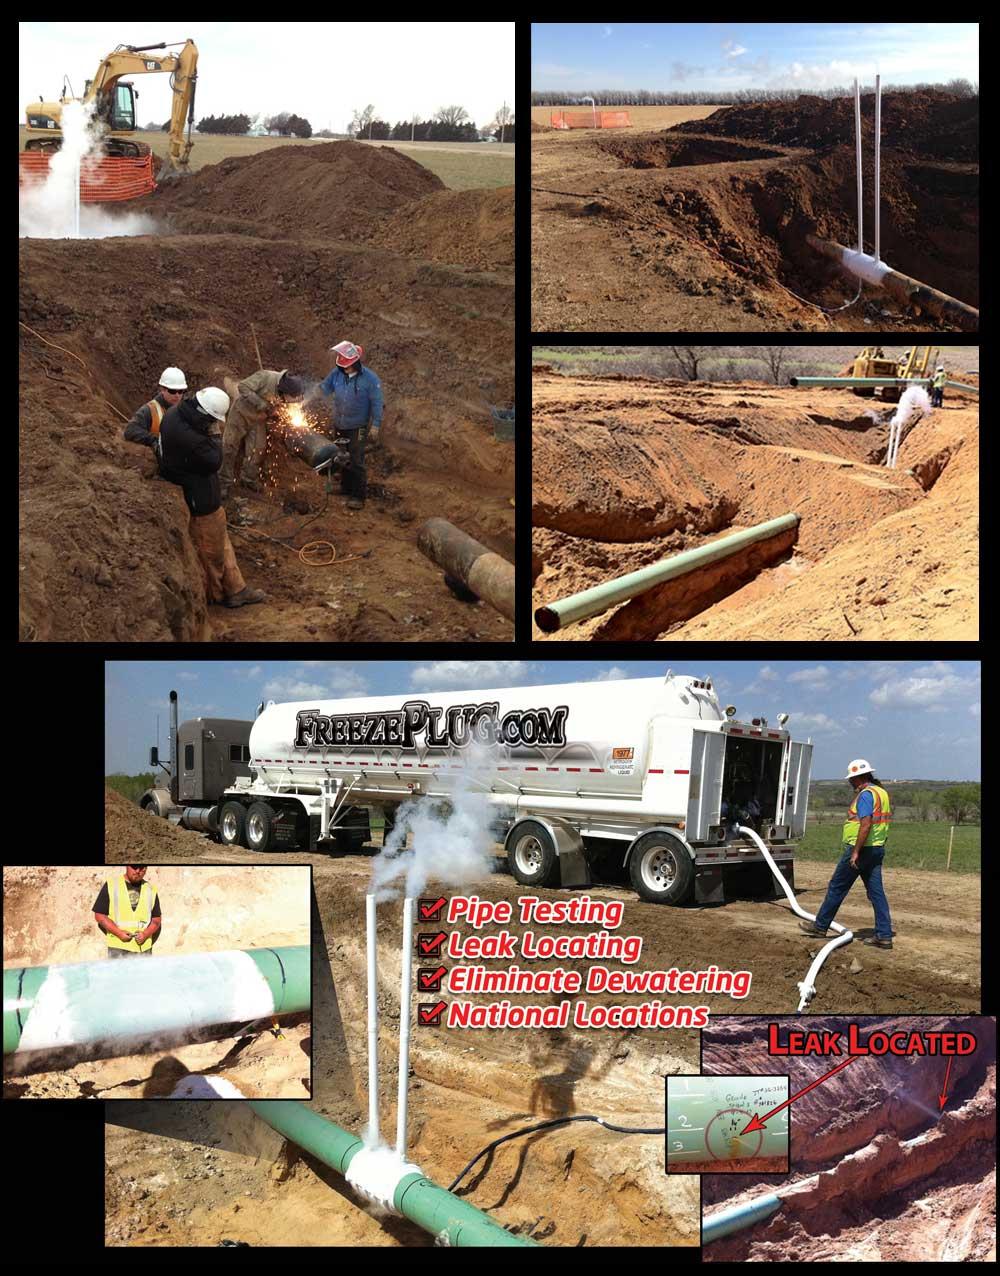 Industrial Pipeline Leak Detection Services